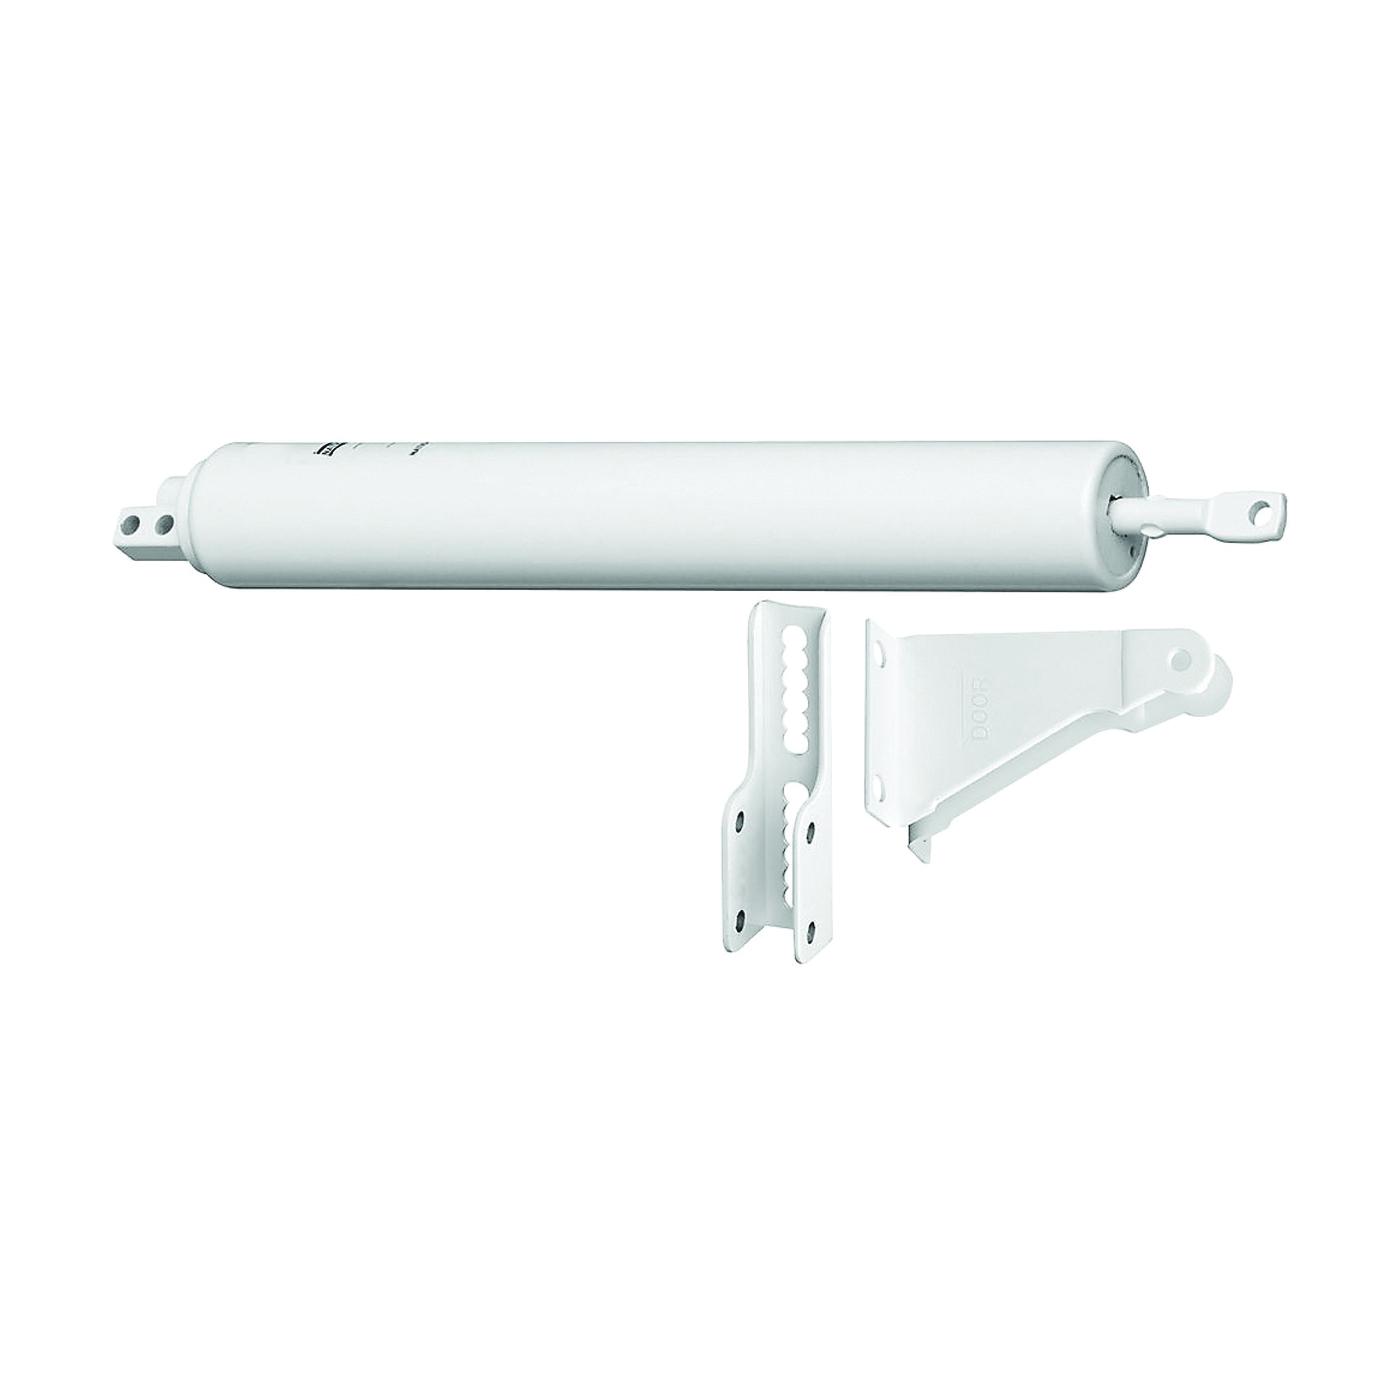 Picture of National Hardware V1346 Series N349-282 Door Closer, Steel